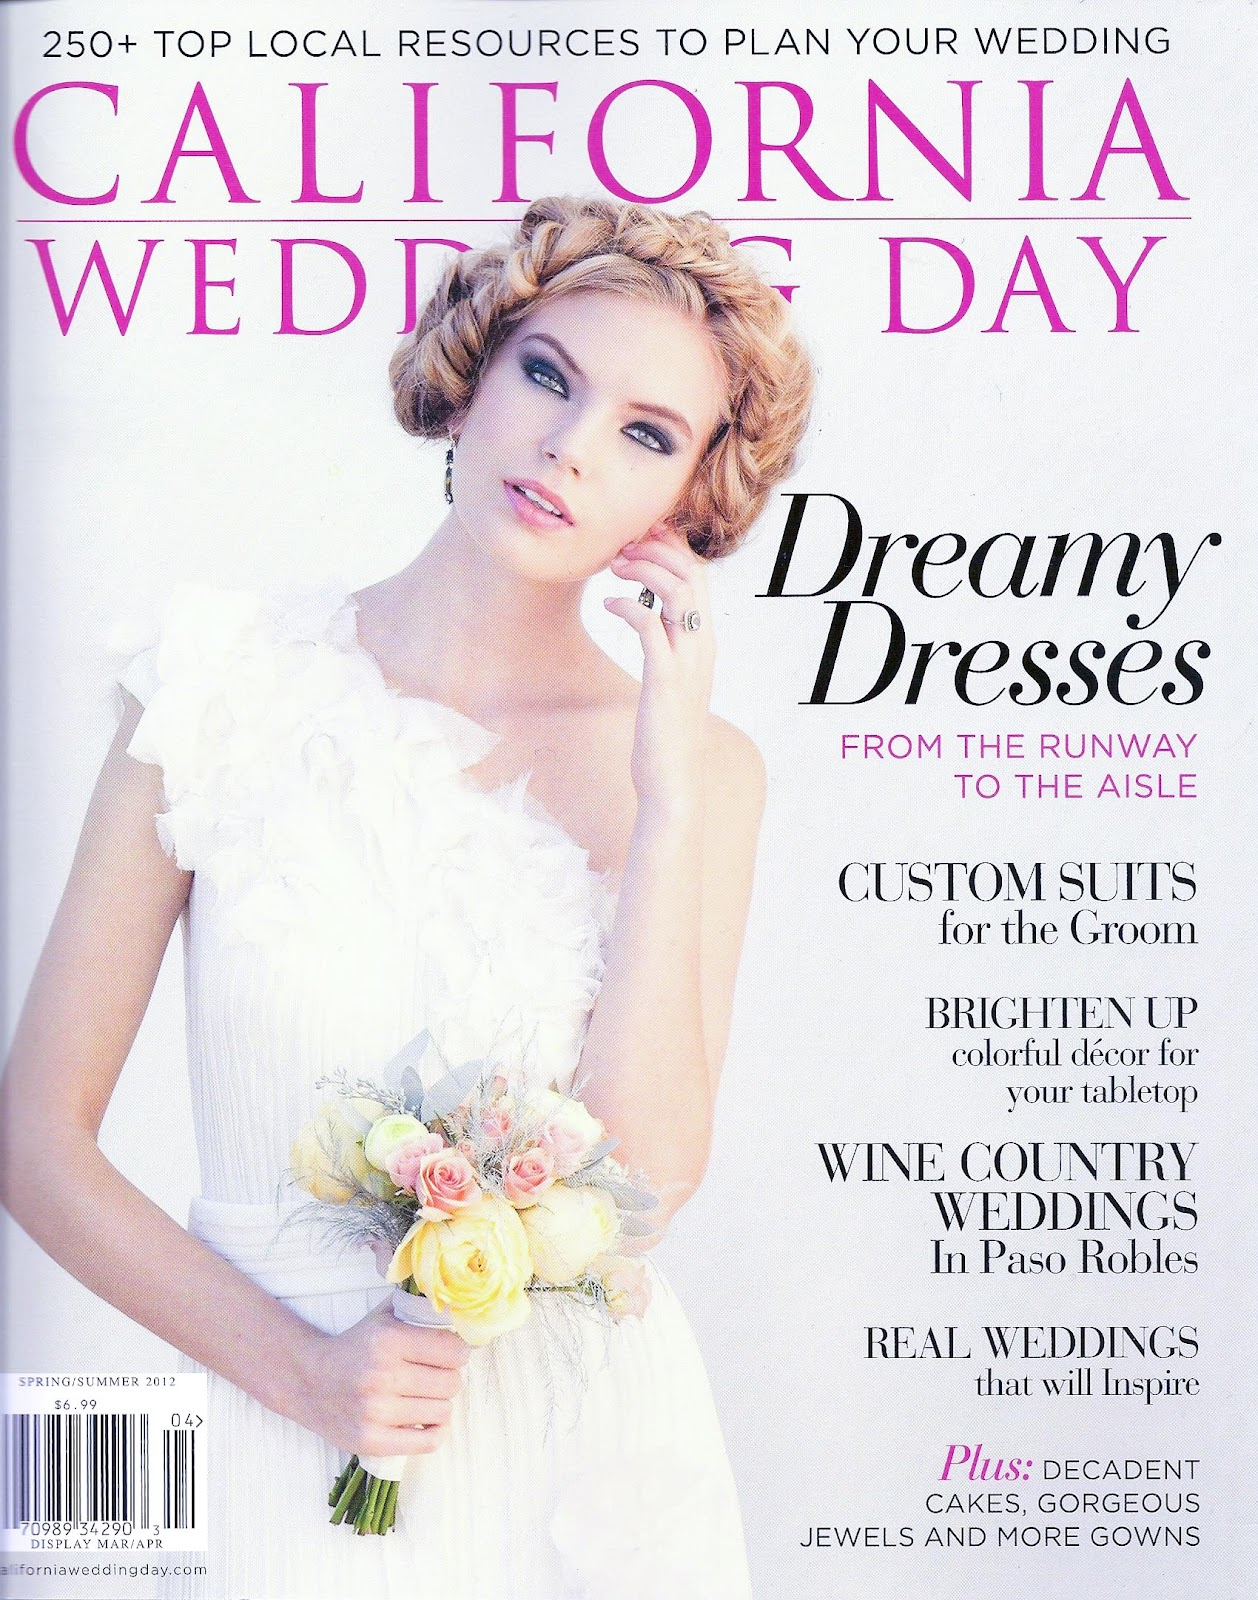 sylvie-gil-film-photography-wedding-california-wedding-day-alicia-design-published-print-magazine